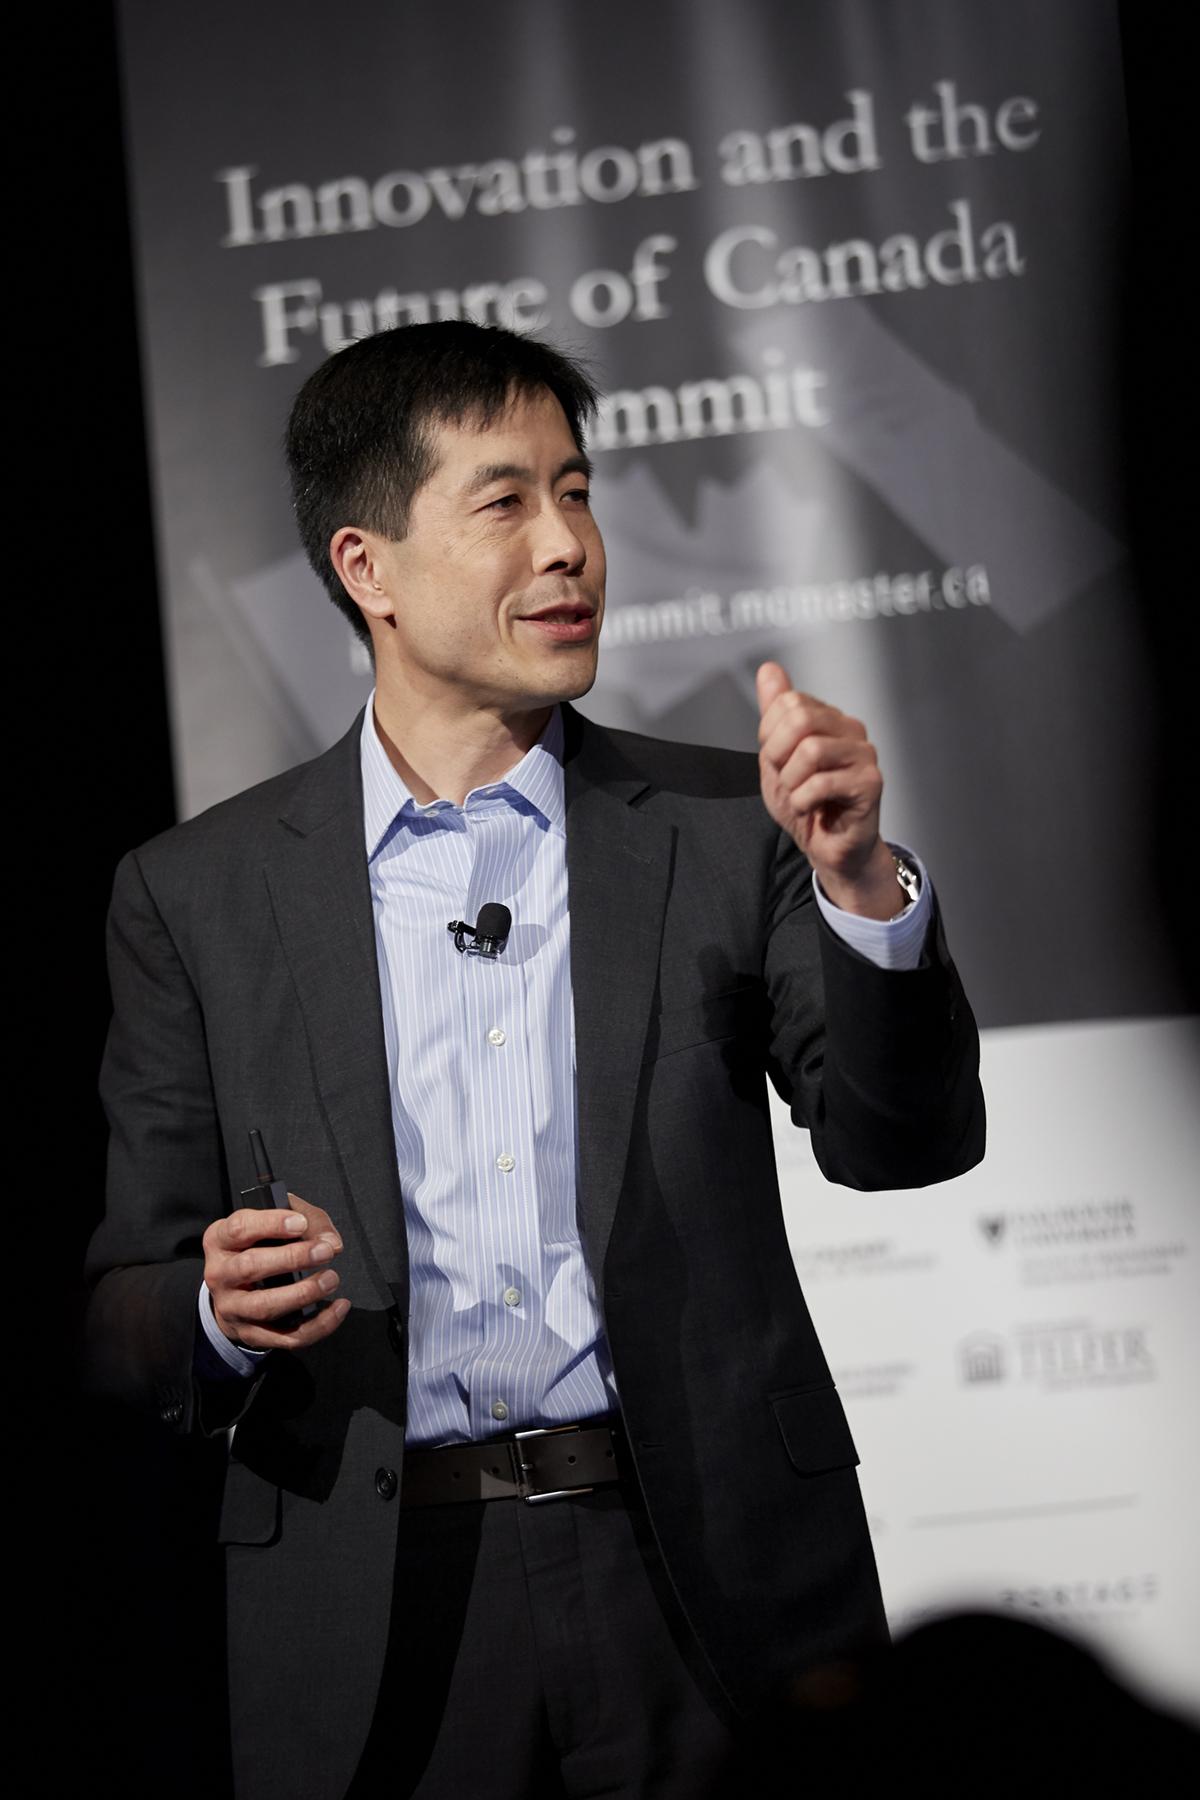 Michael Chui speaking on stage.